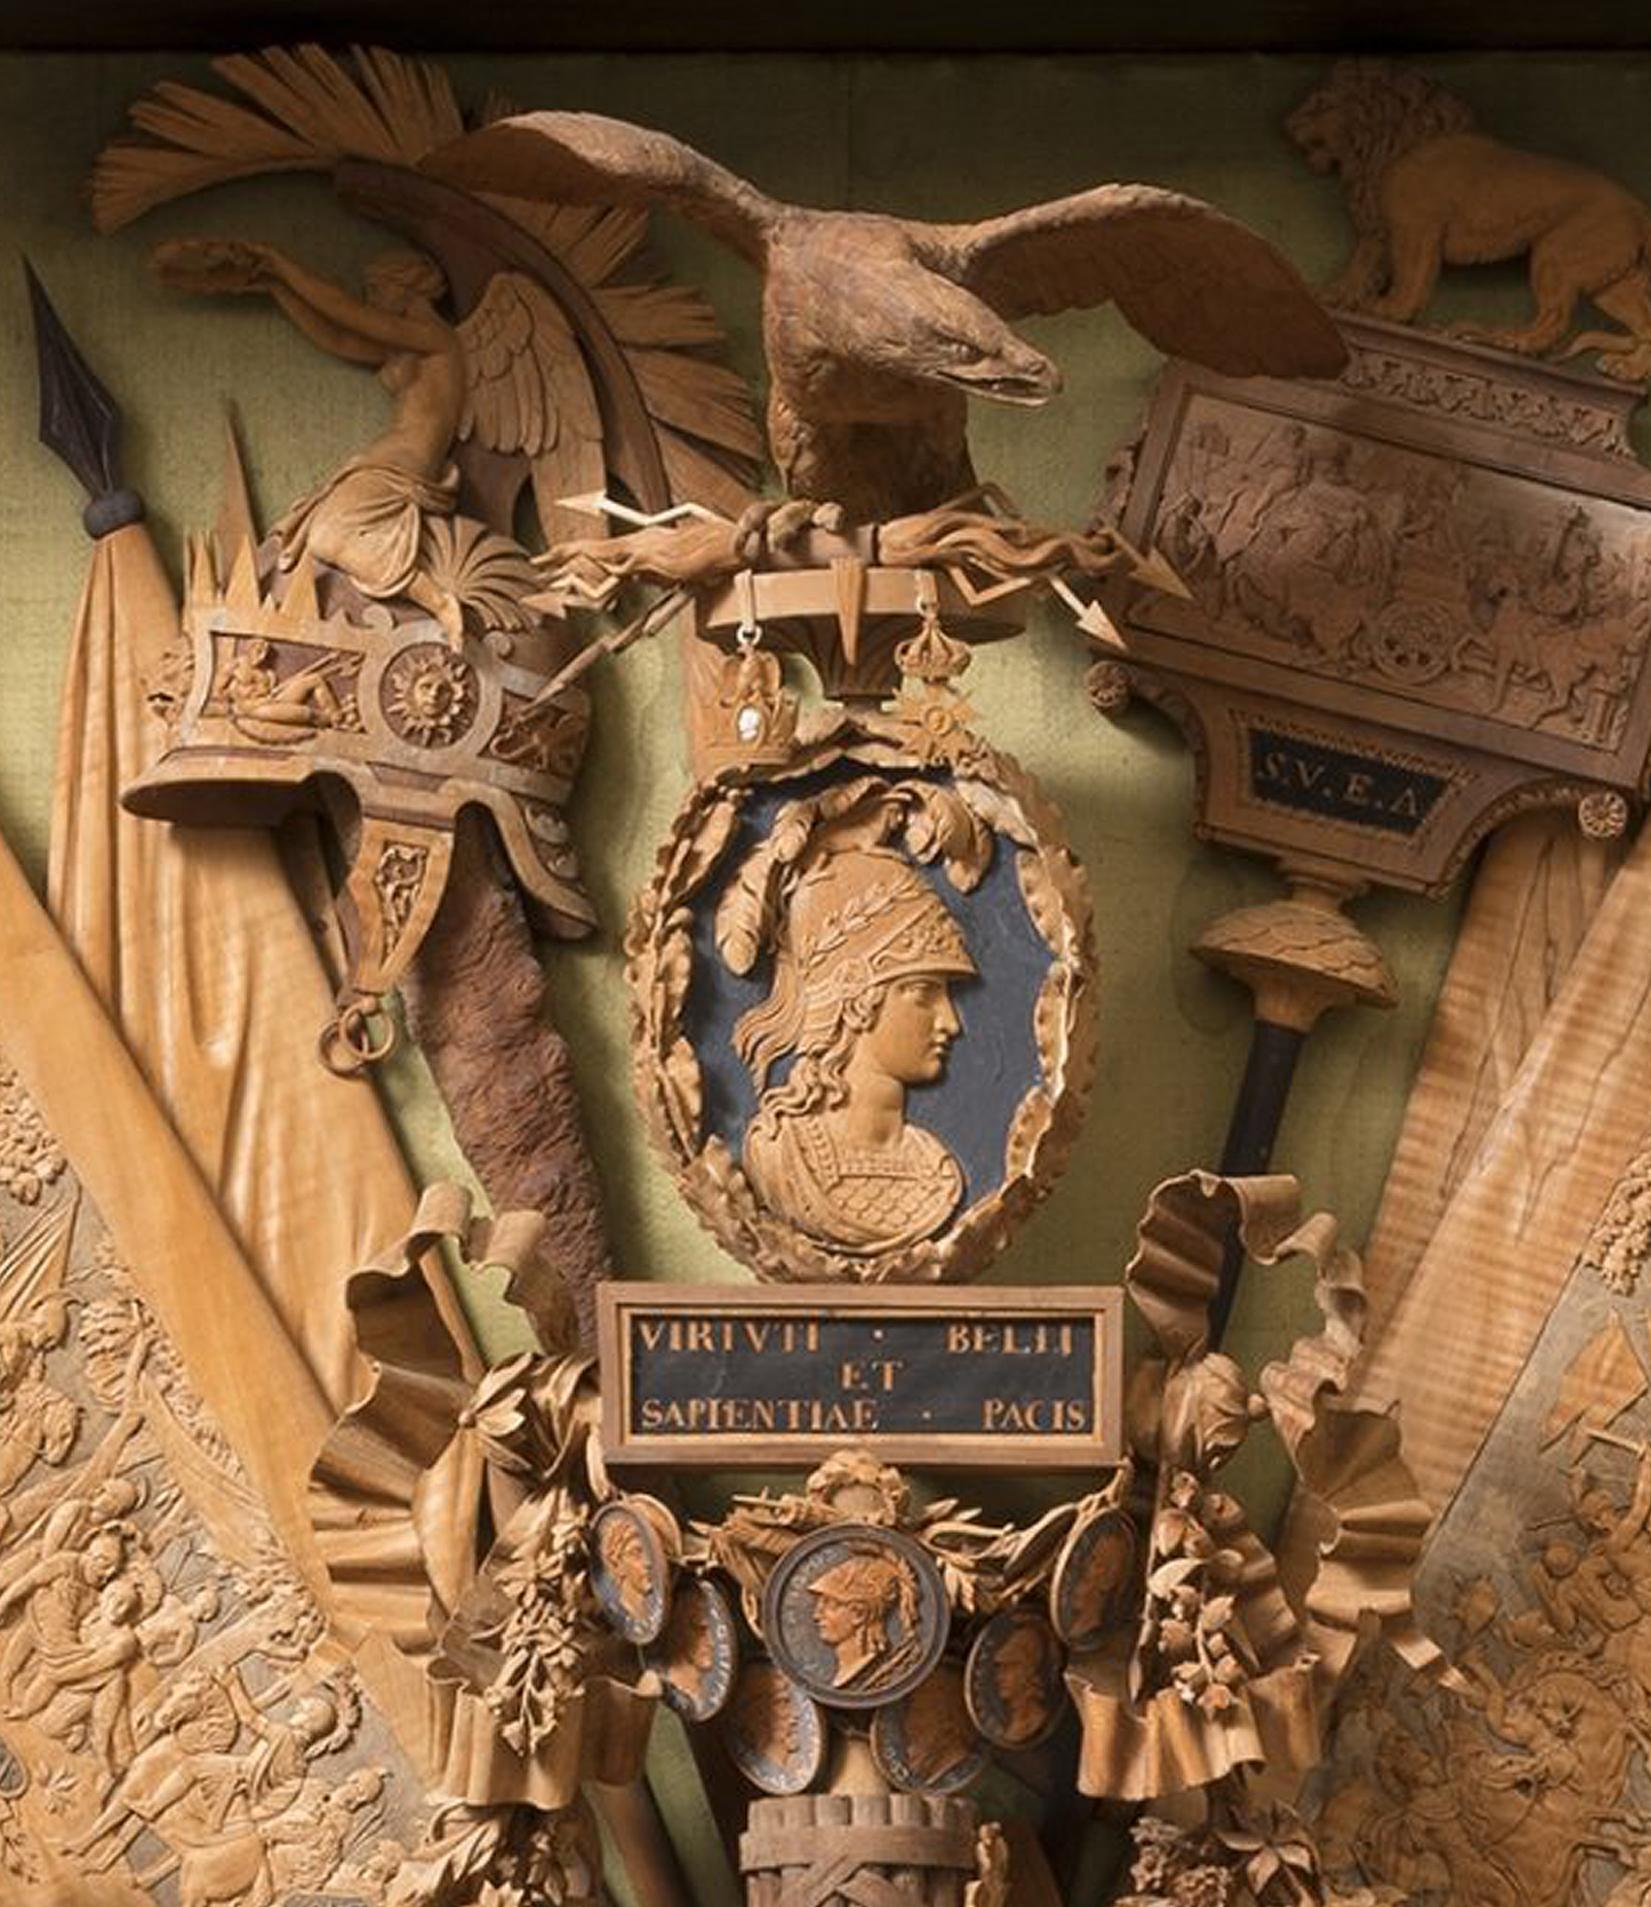 10B Bonzanigo Military trophy 1793-1814 Palazzo Madama Turin detail 1